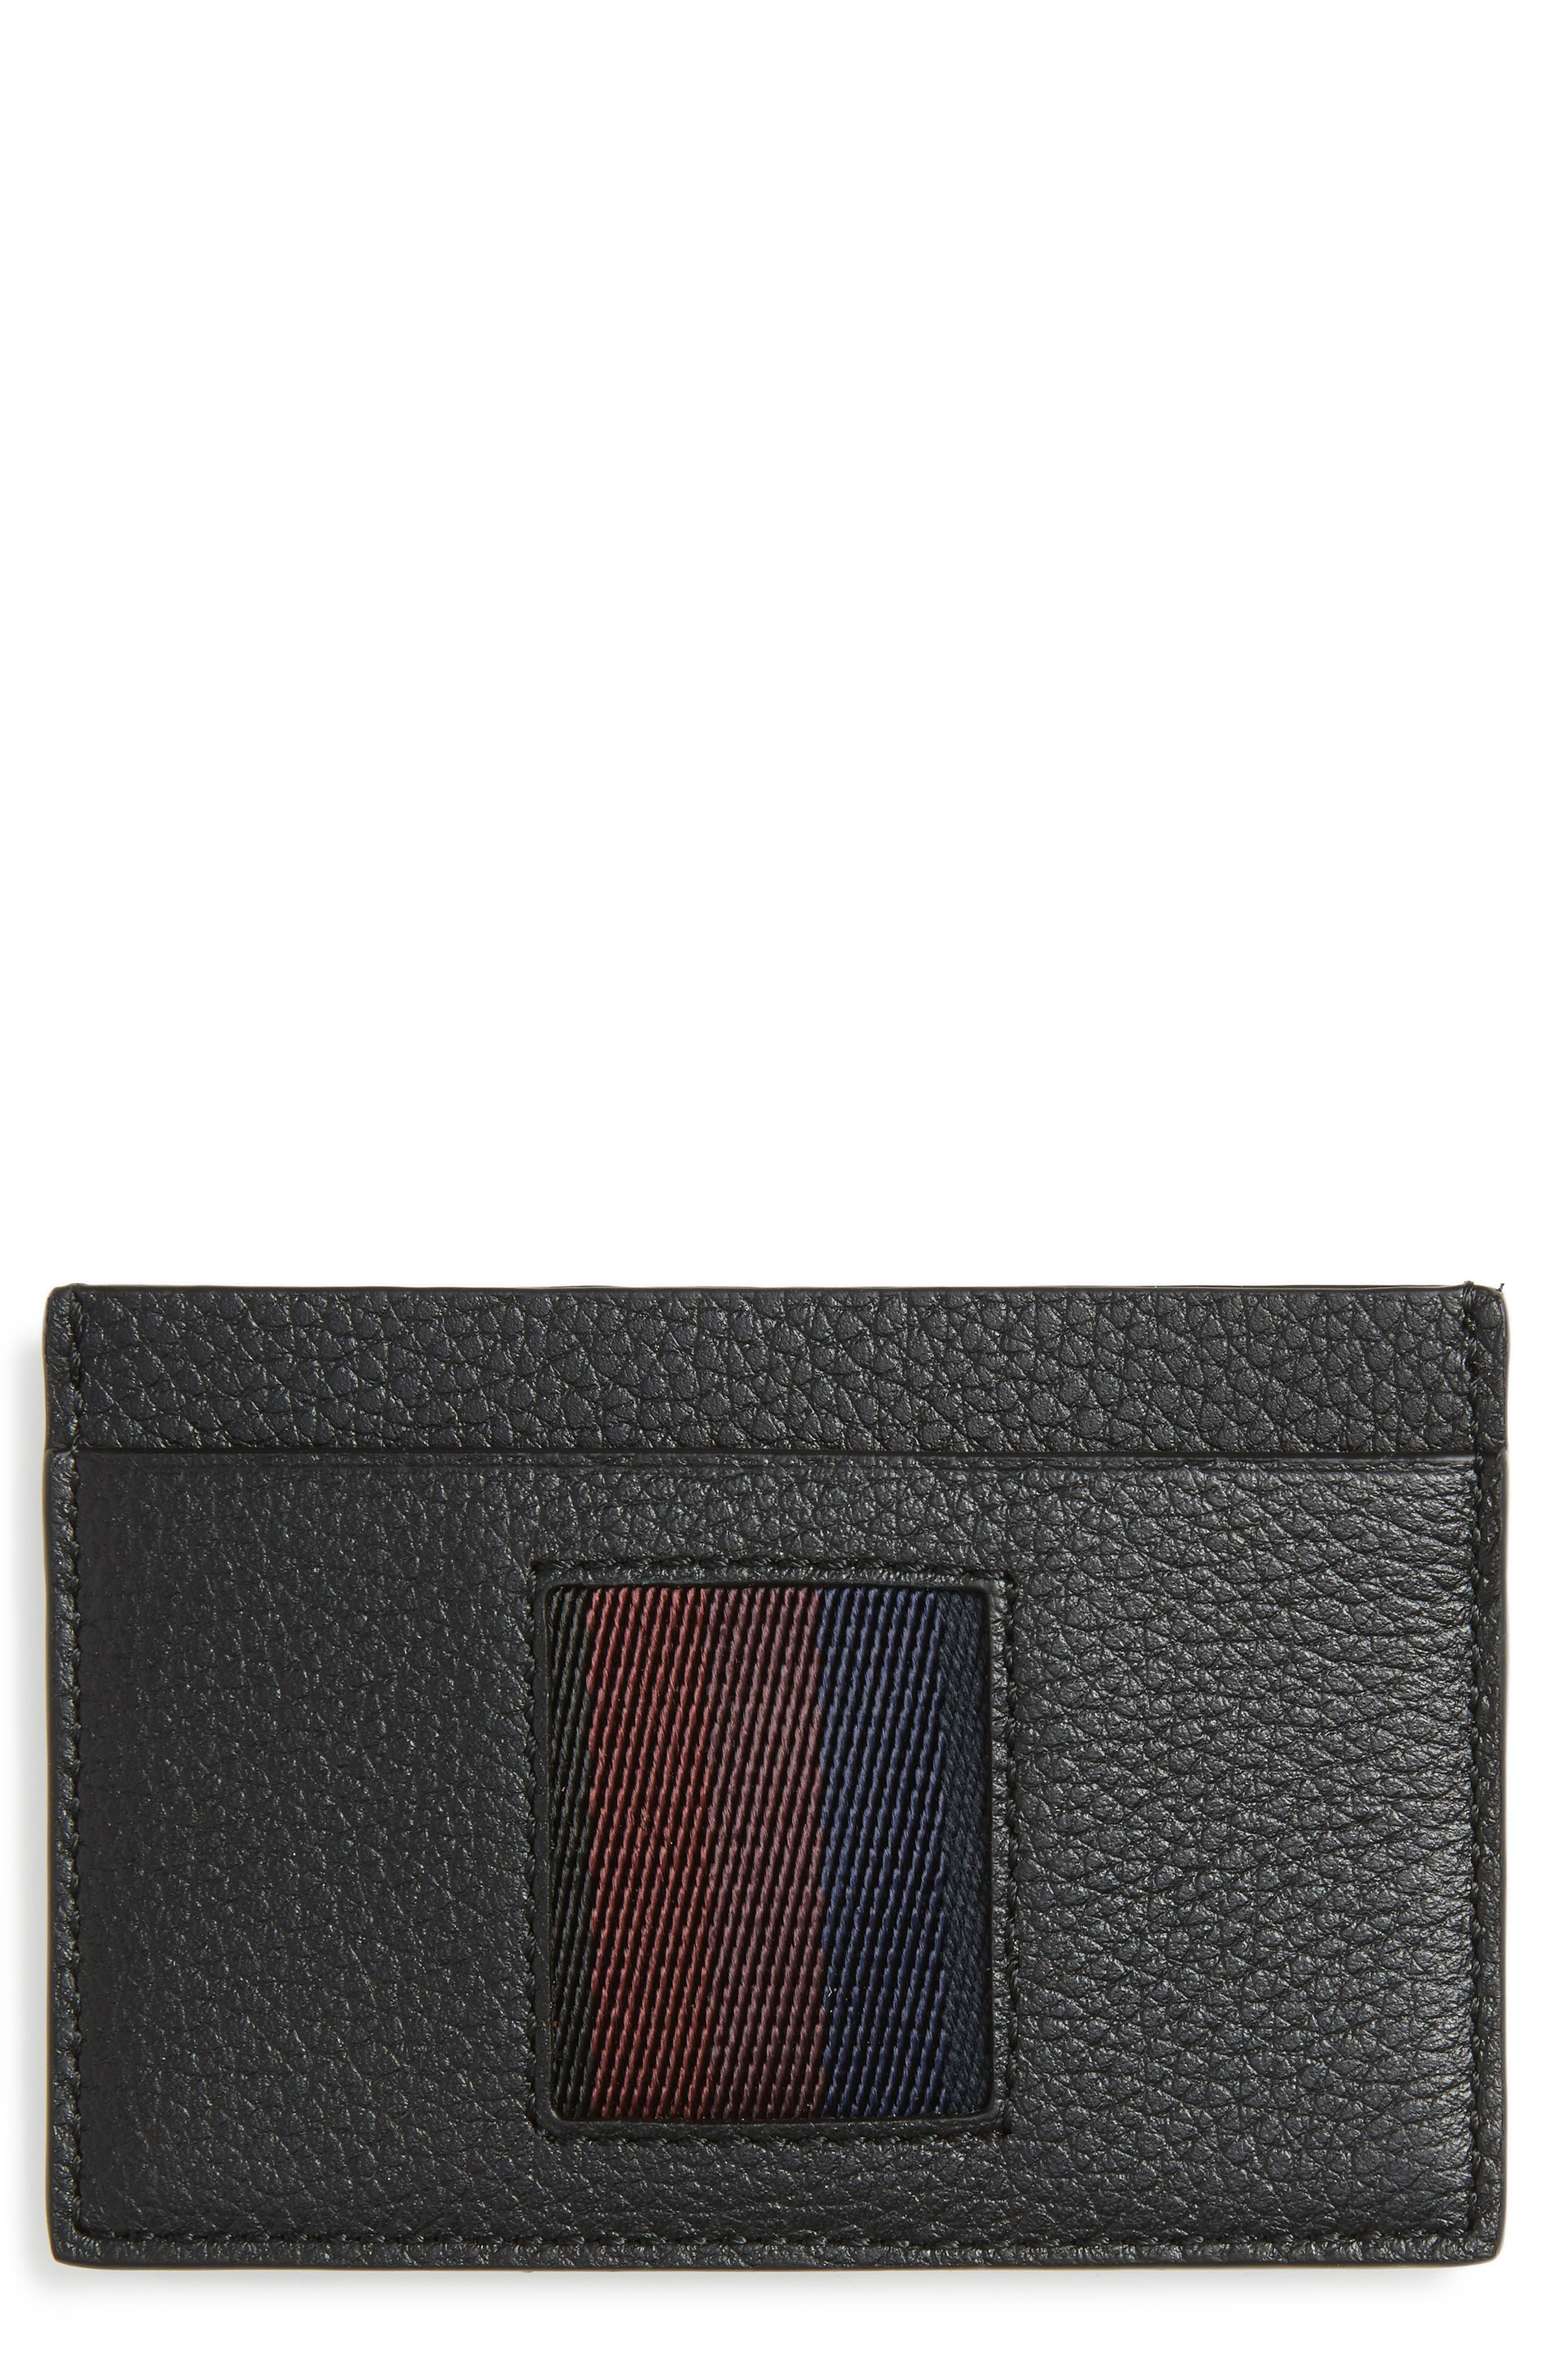 Paul Smith Stripe Webbing Leather Card Case